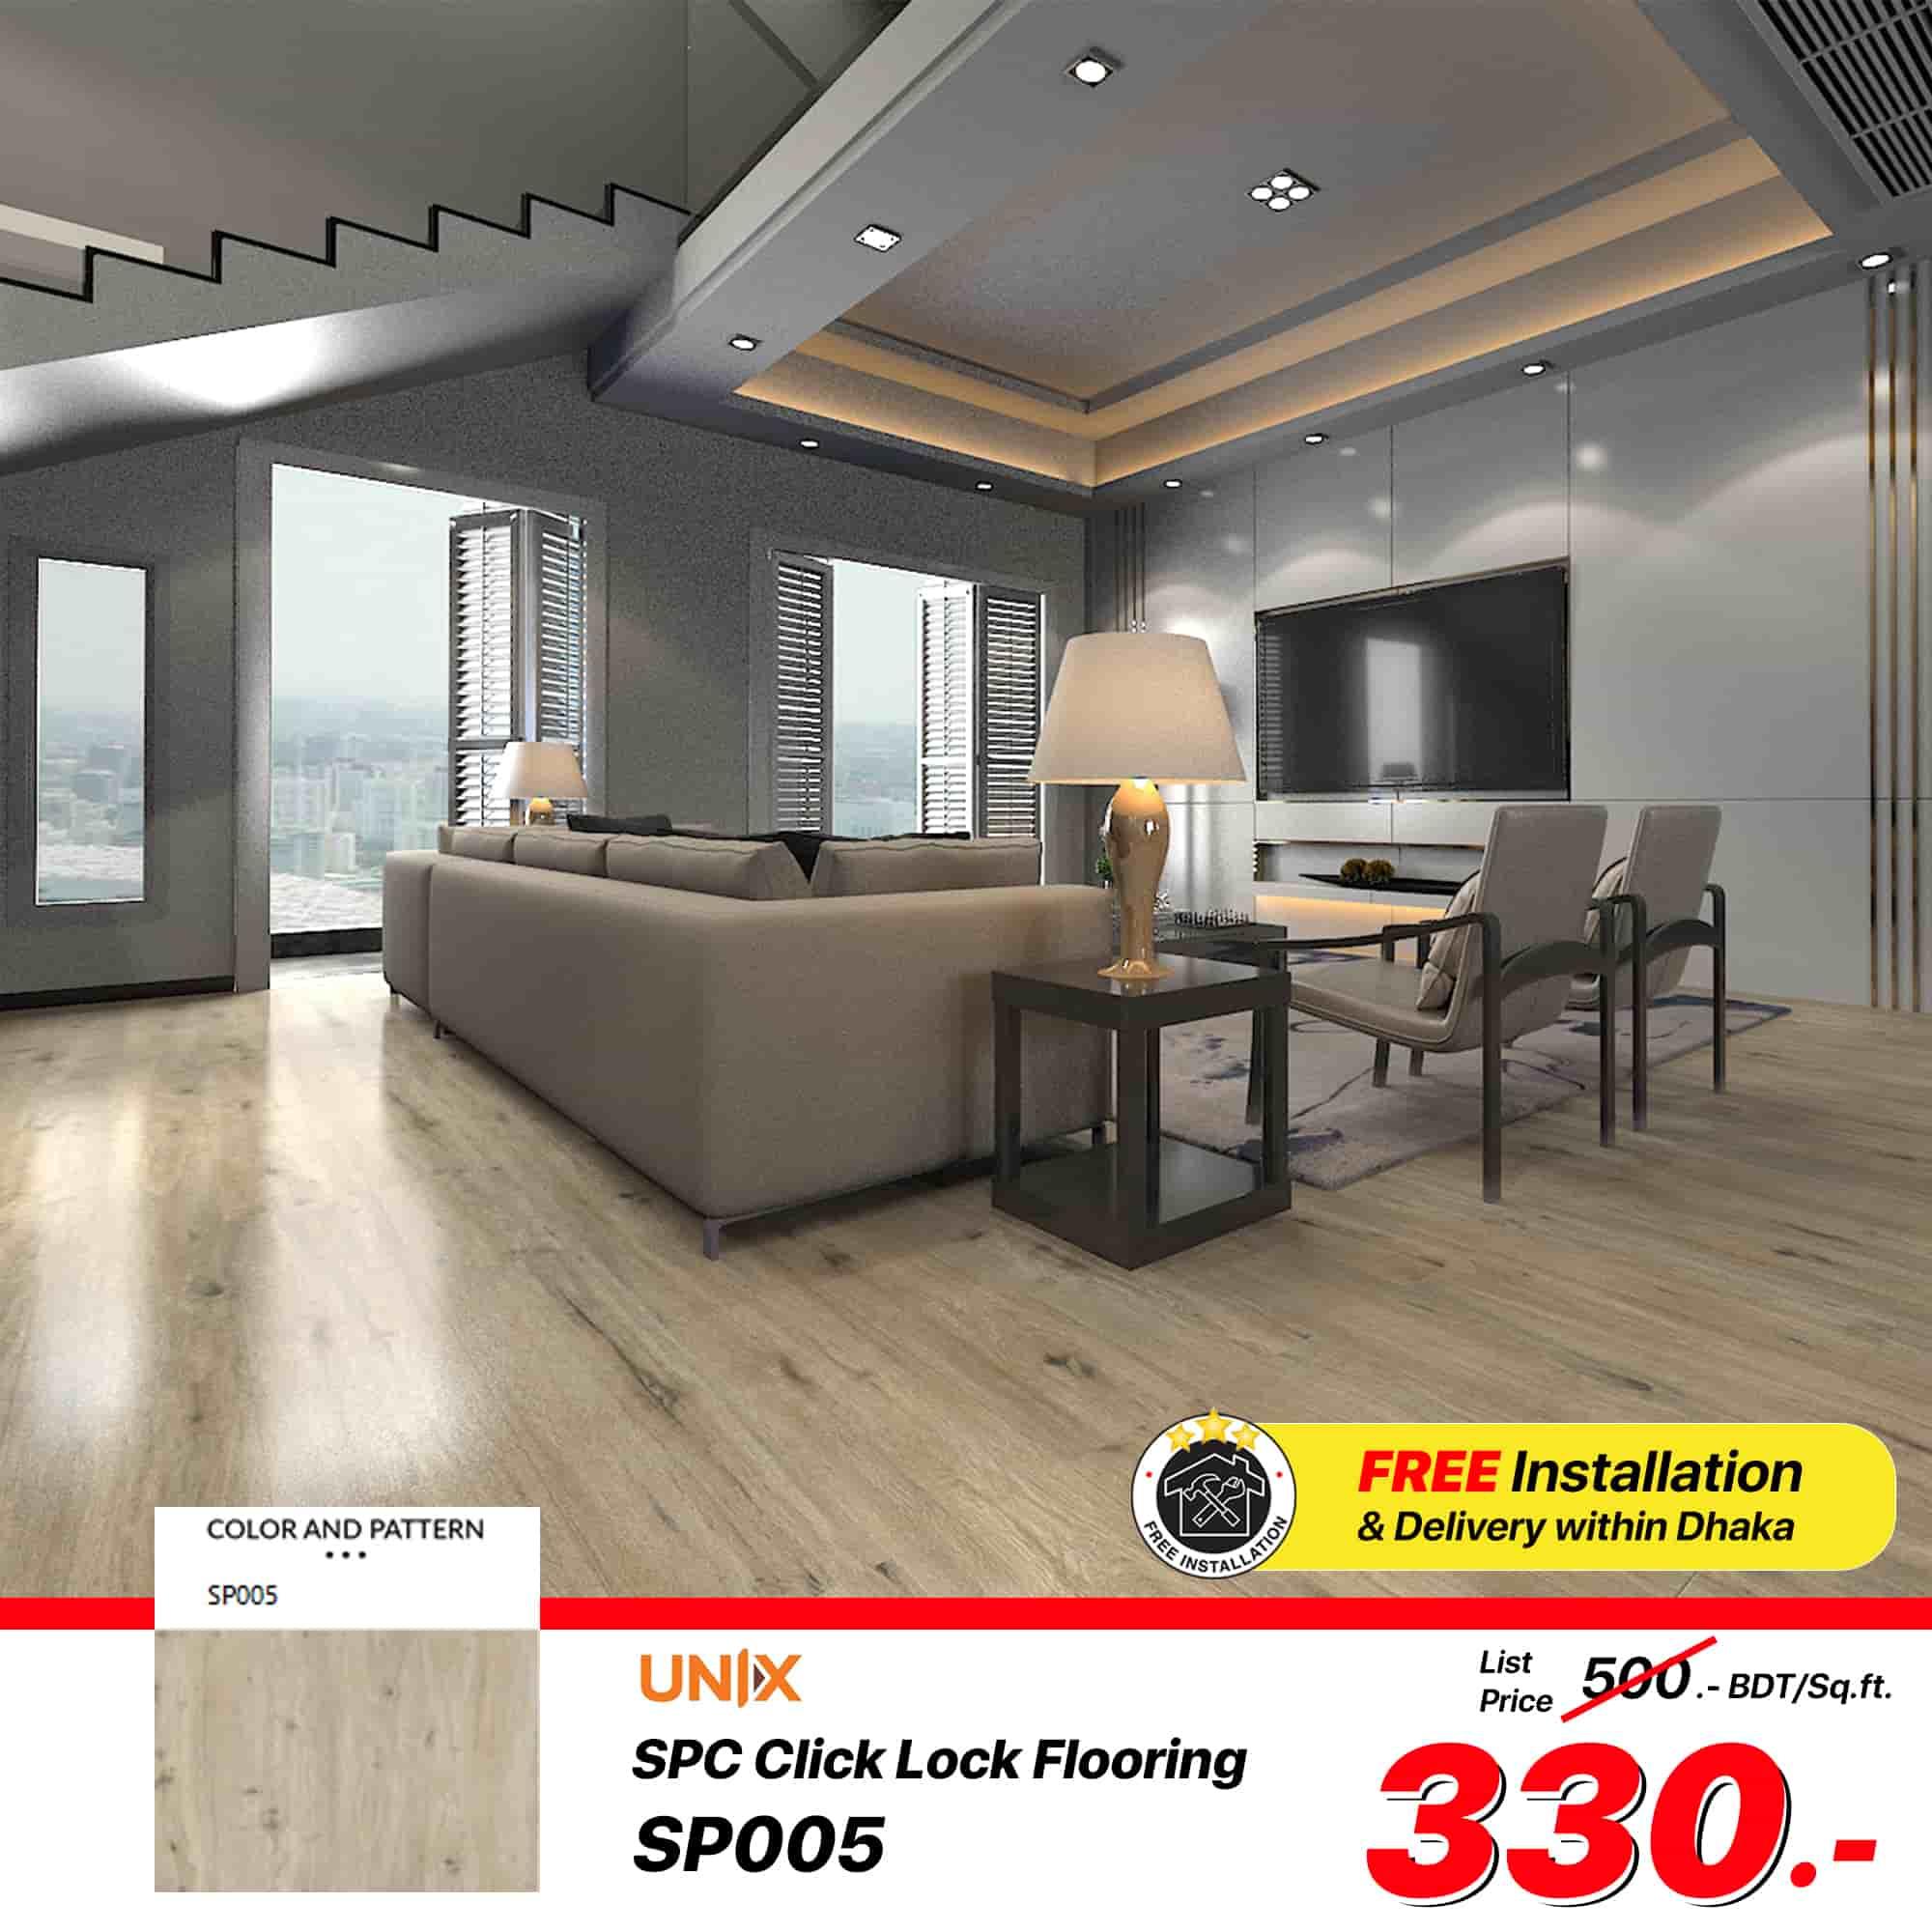 SPC Click Lock Flooring (SP005) Size: 180x1220x4 mm